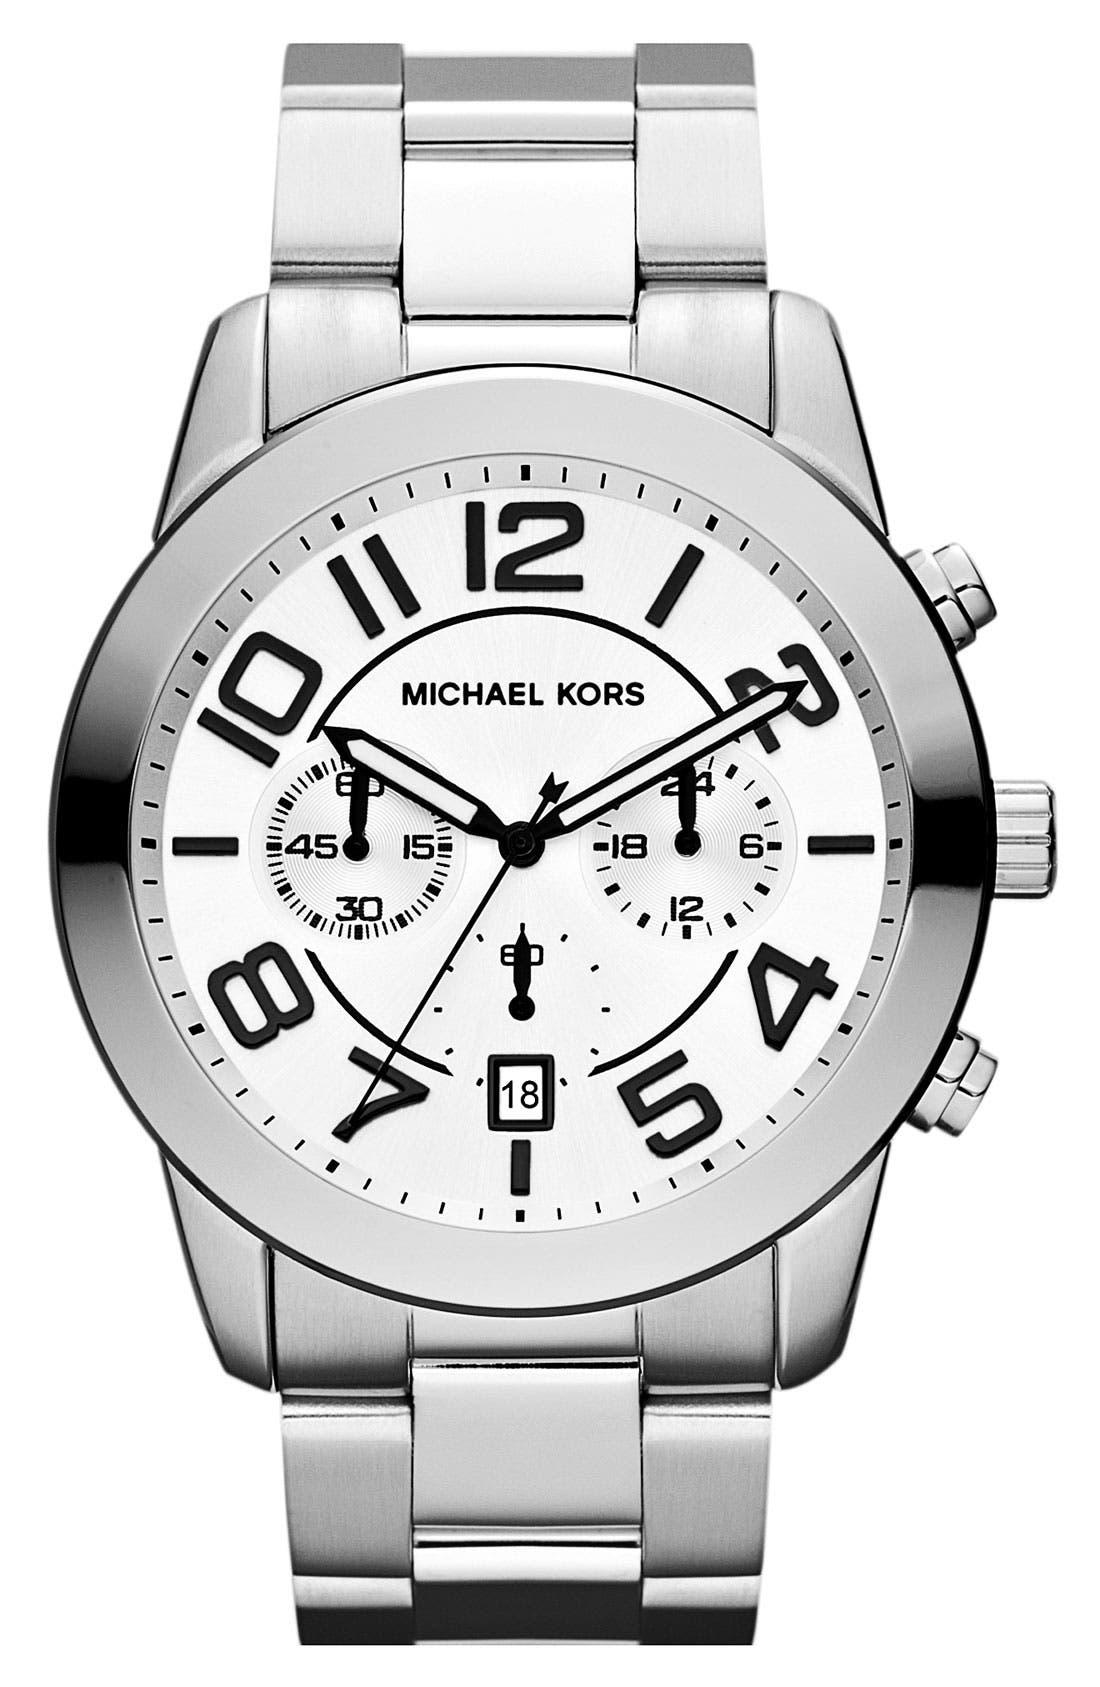 Main Image - Michael Kors 'Mercer' Large Chronograph Bracelet Watch, 45mm